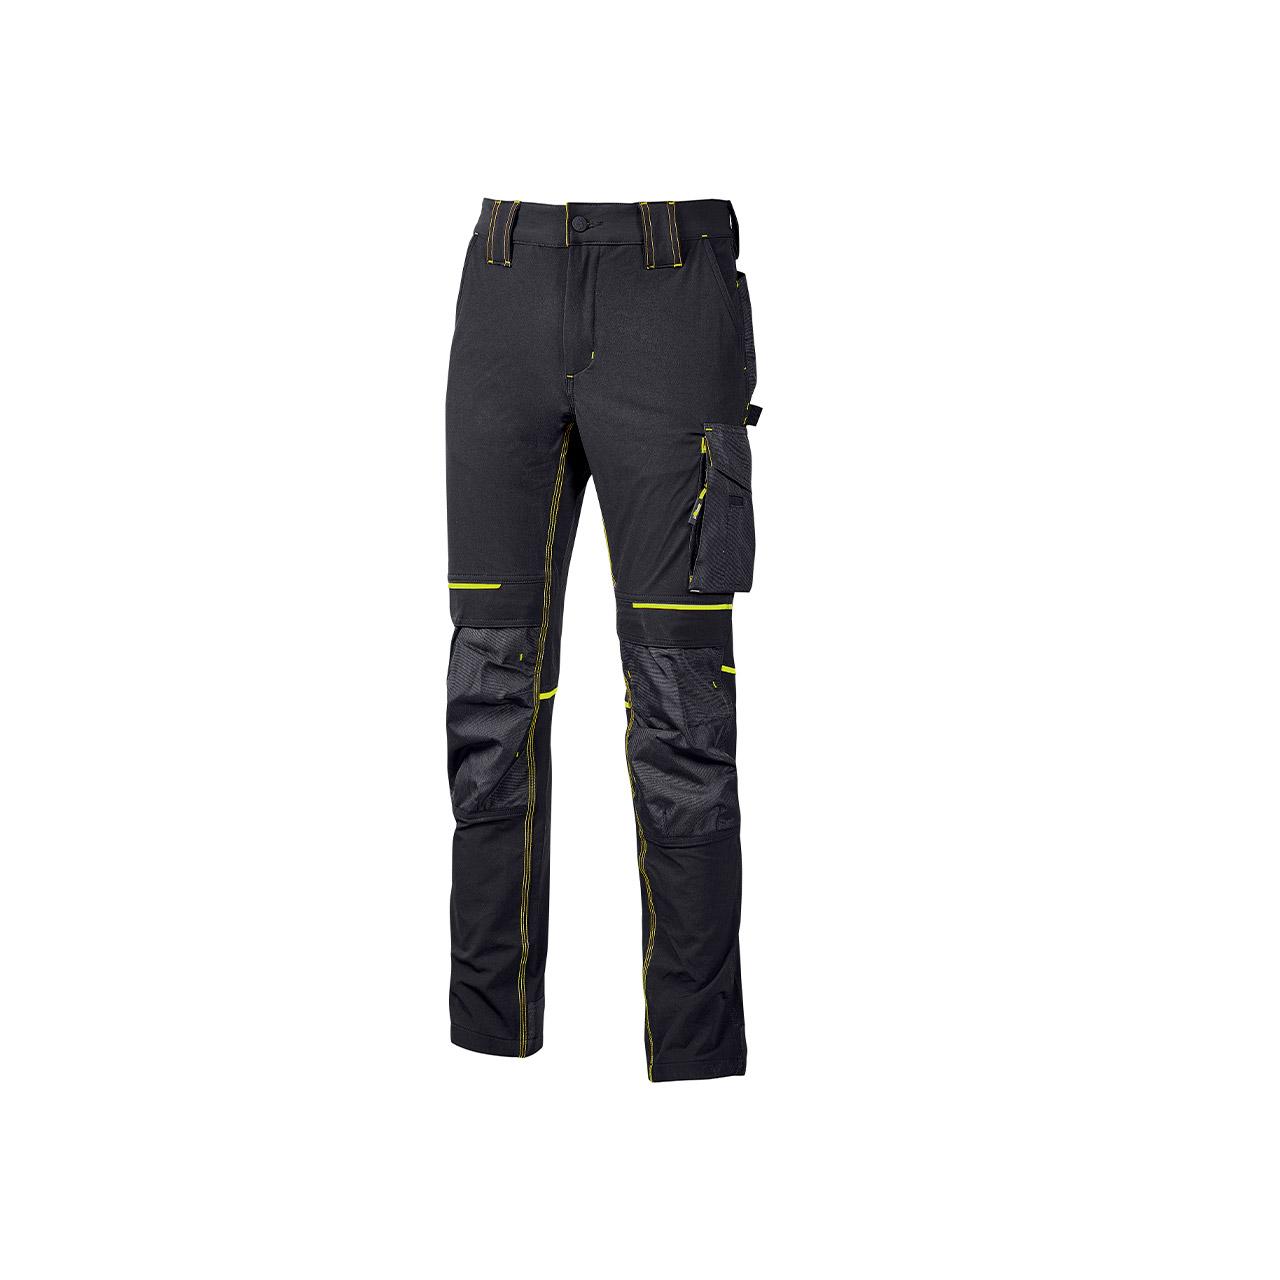 Pantalone Lungo Upower Modello Atom